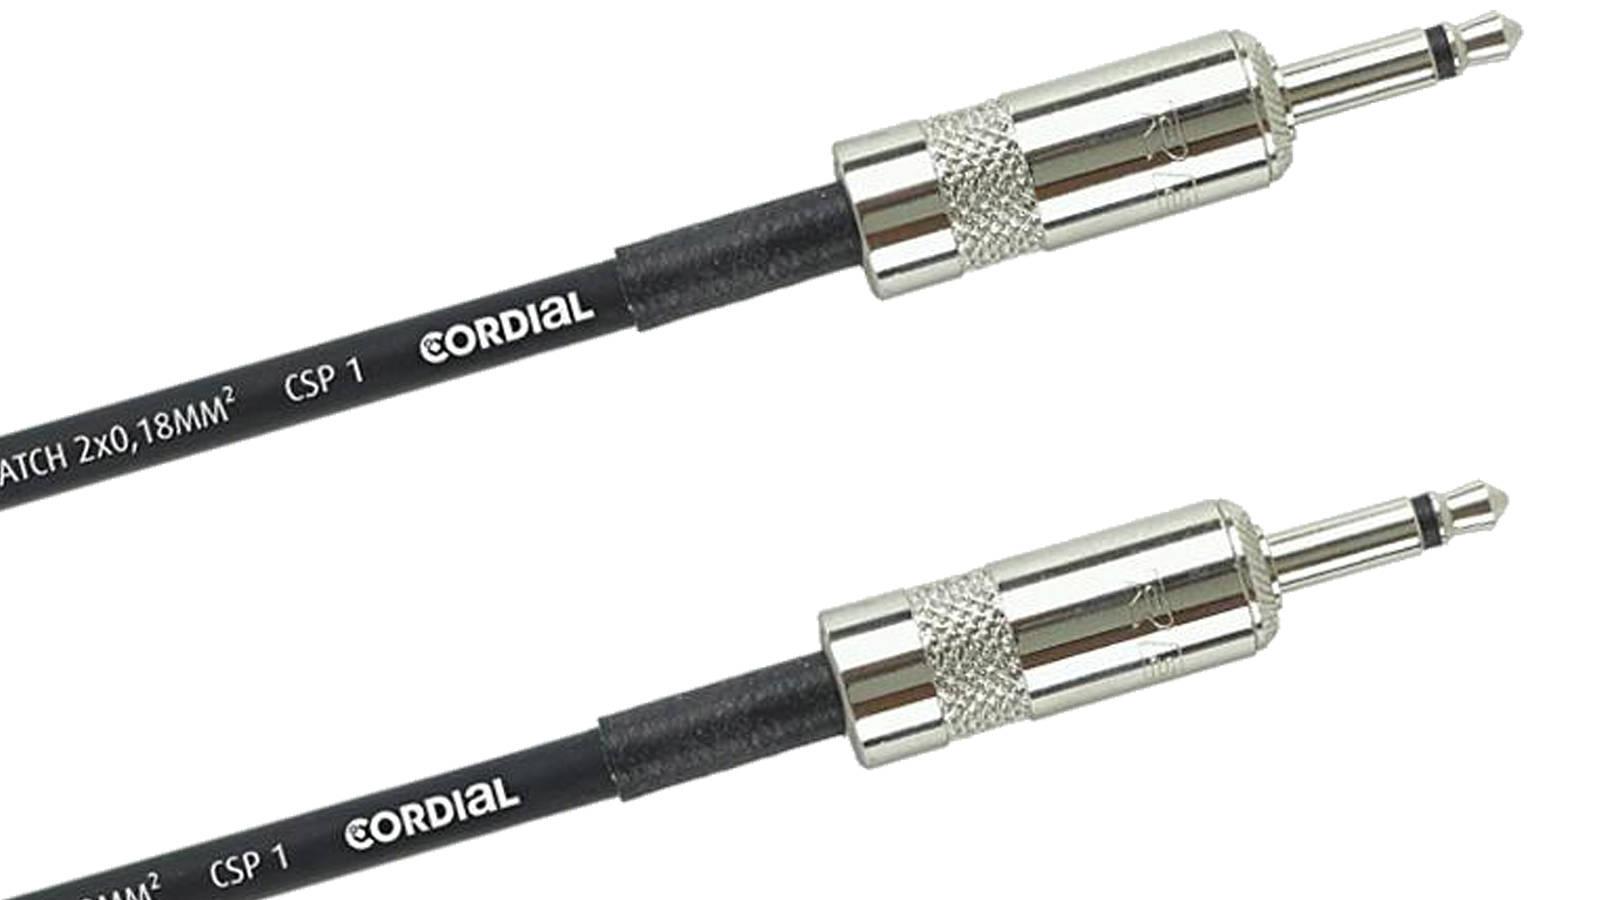 Cordial CPI 0,15 ZZ Patchkabel für Modularsysteme mKL-mKL 15 cm